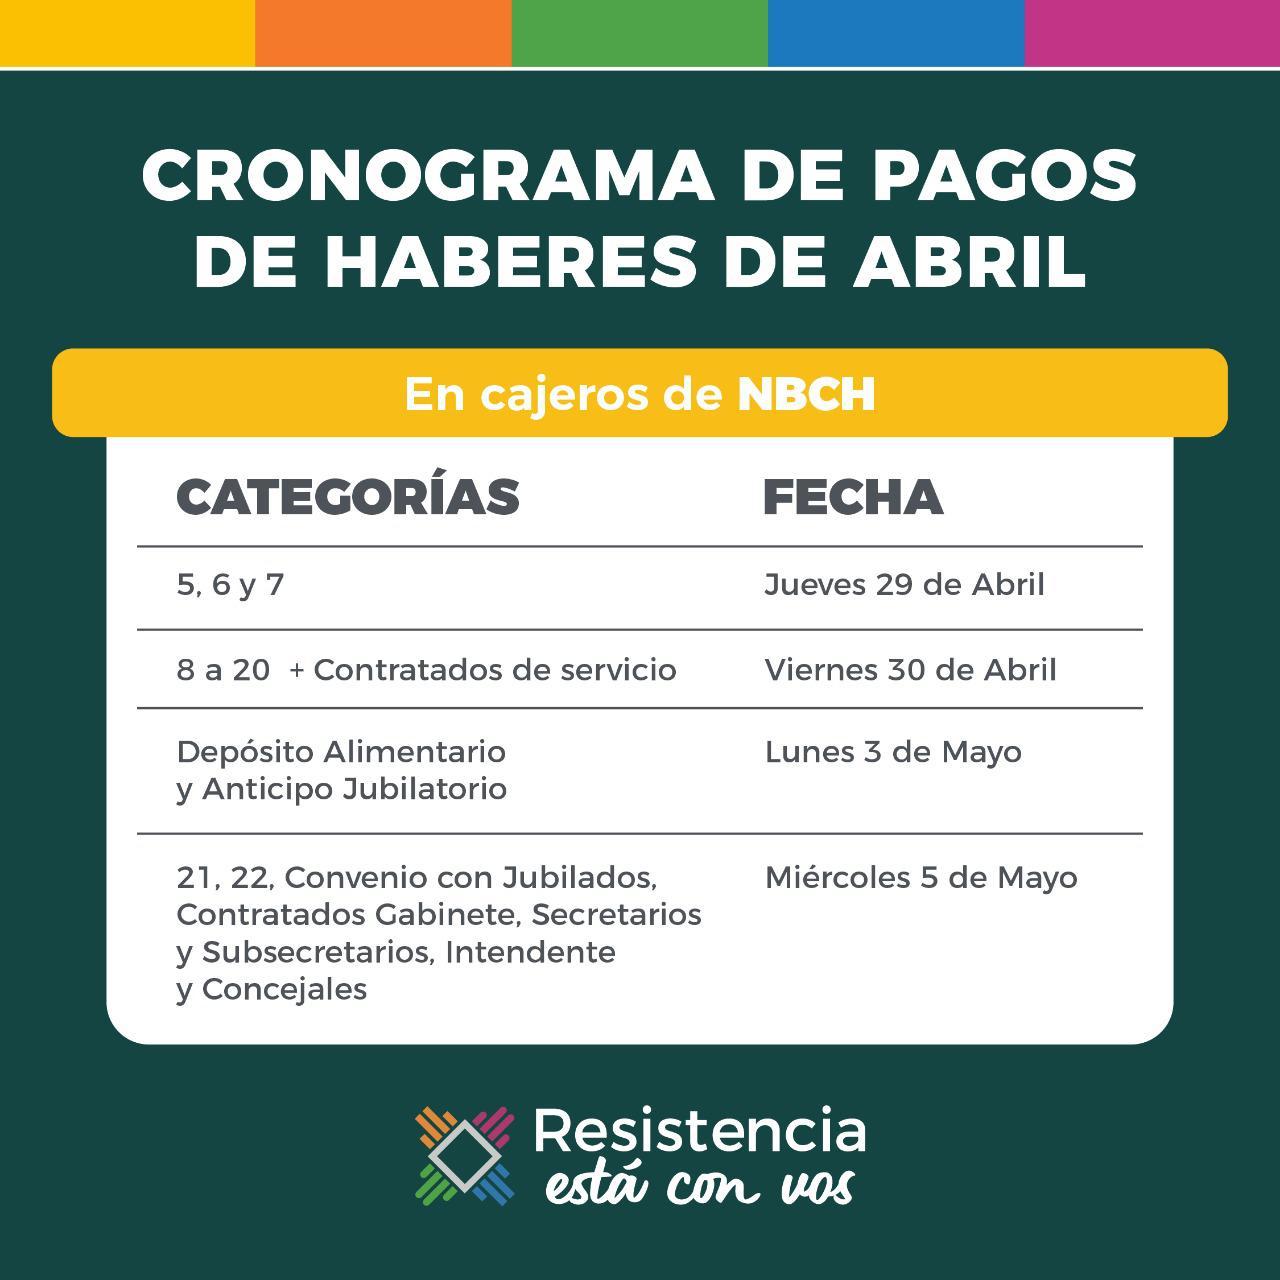 CRONOGRAMA DE PAGOS CON BENEFICIOS